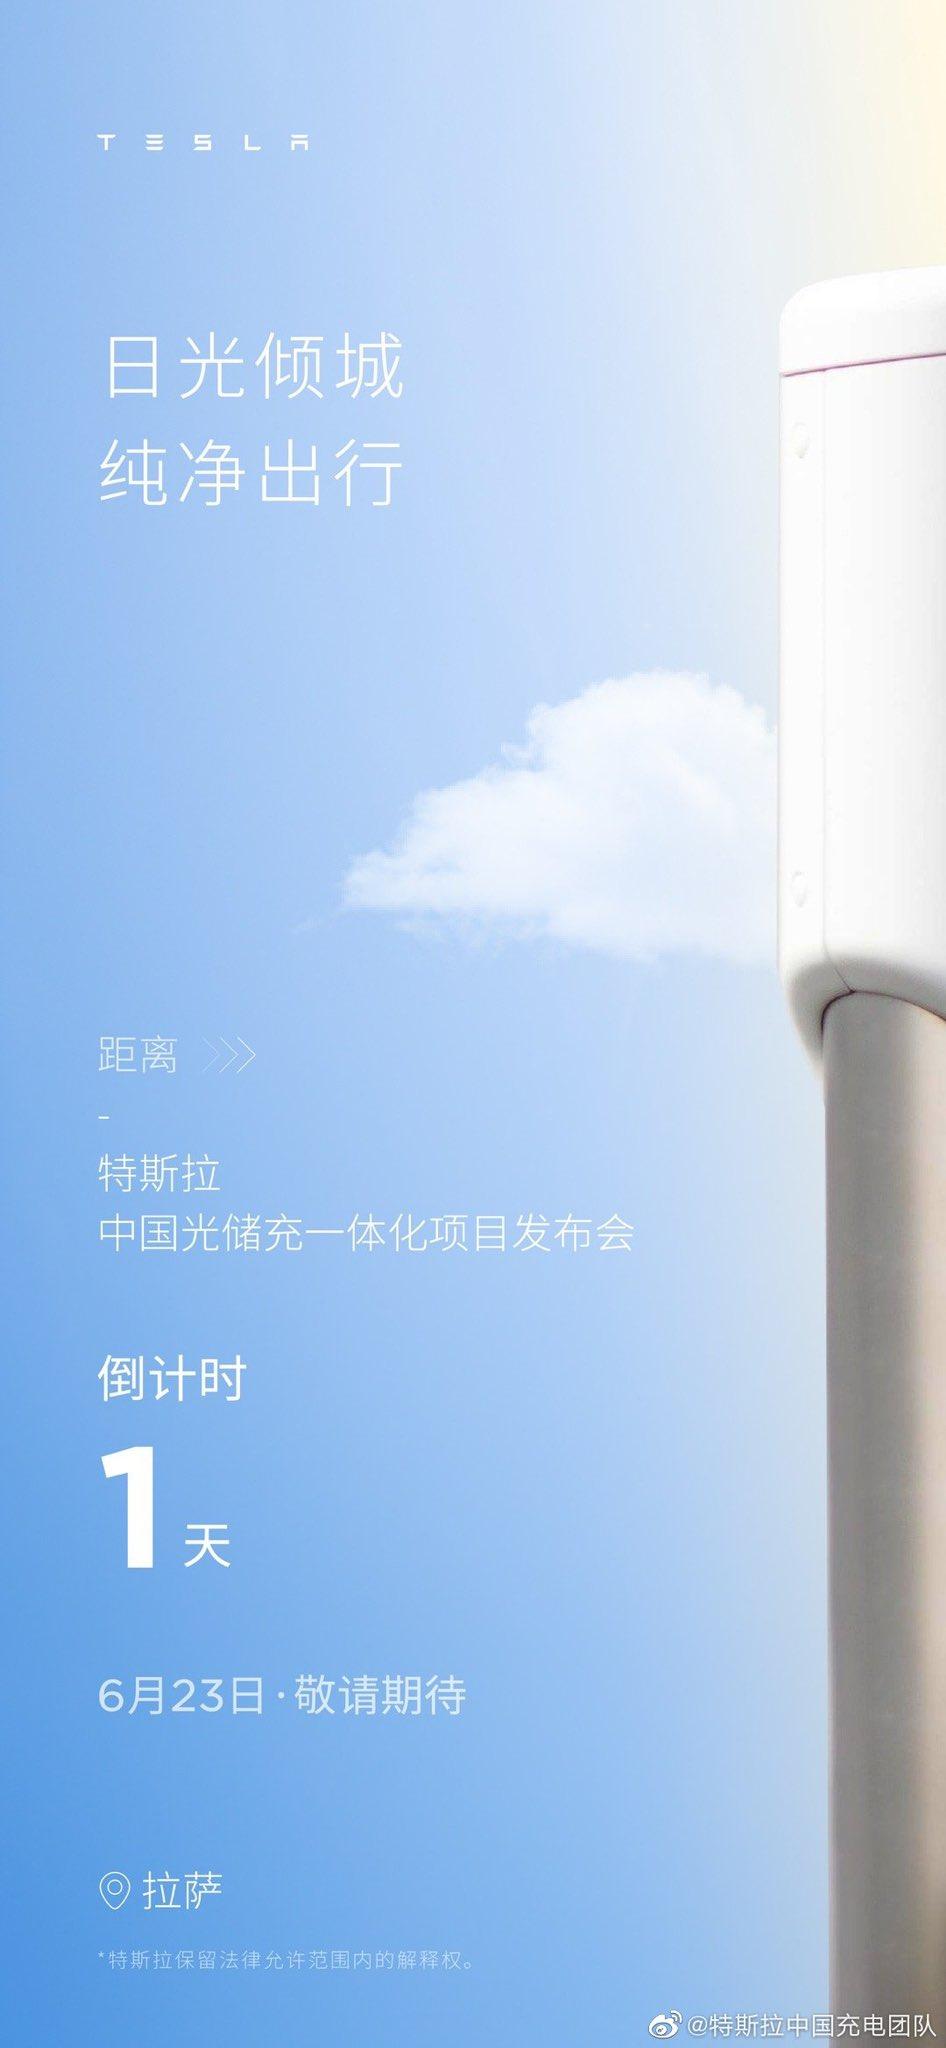 tesla-china-supercharger